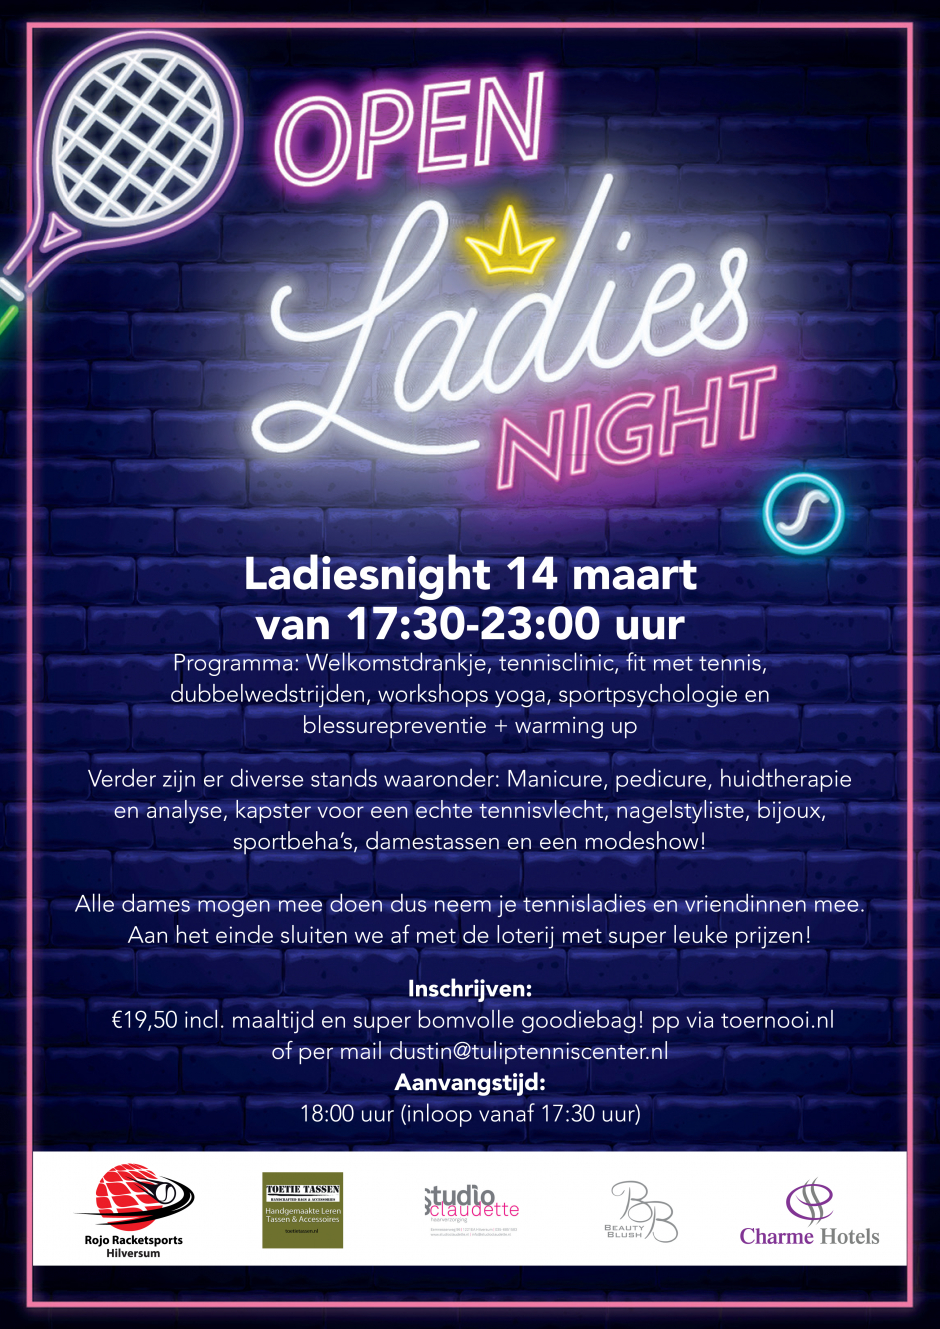 ladies_night_poster_2.jpg